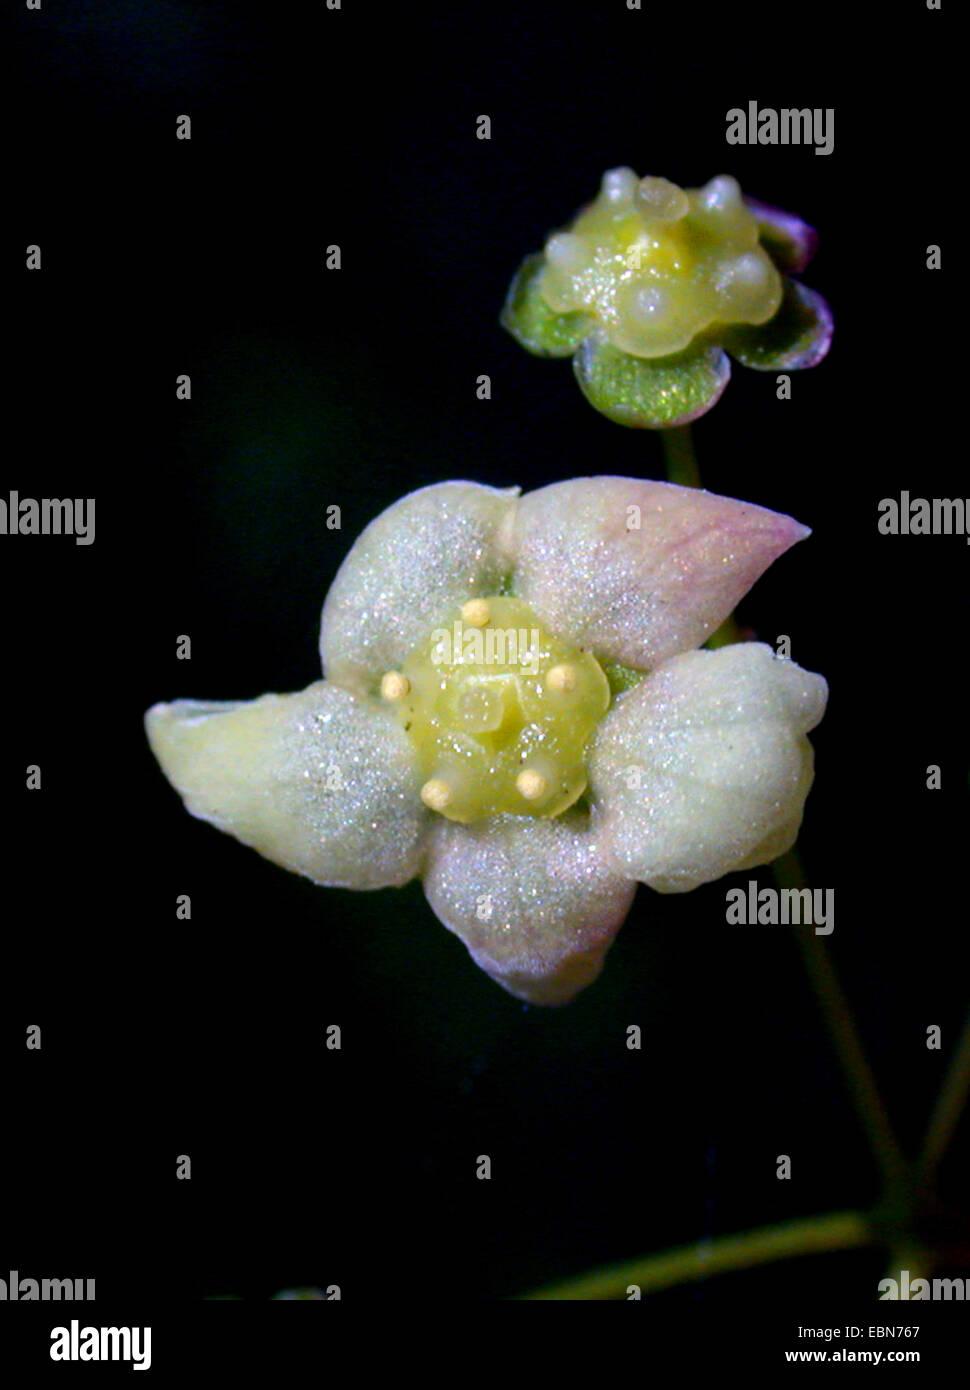 Dingle dangle tree (Euonymus planipes), flower - Stock Image